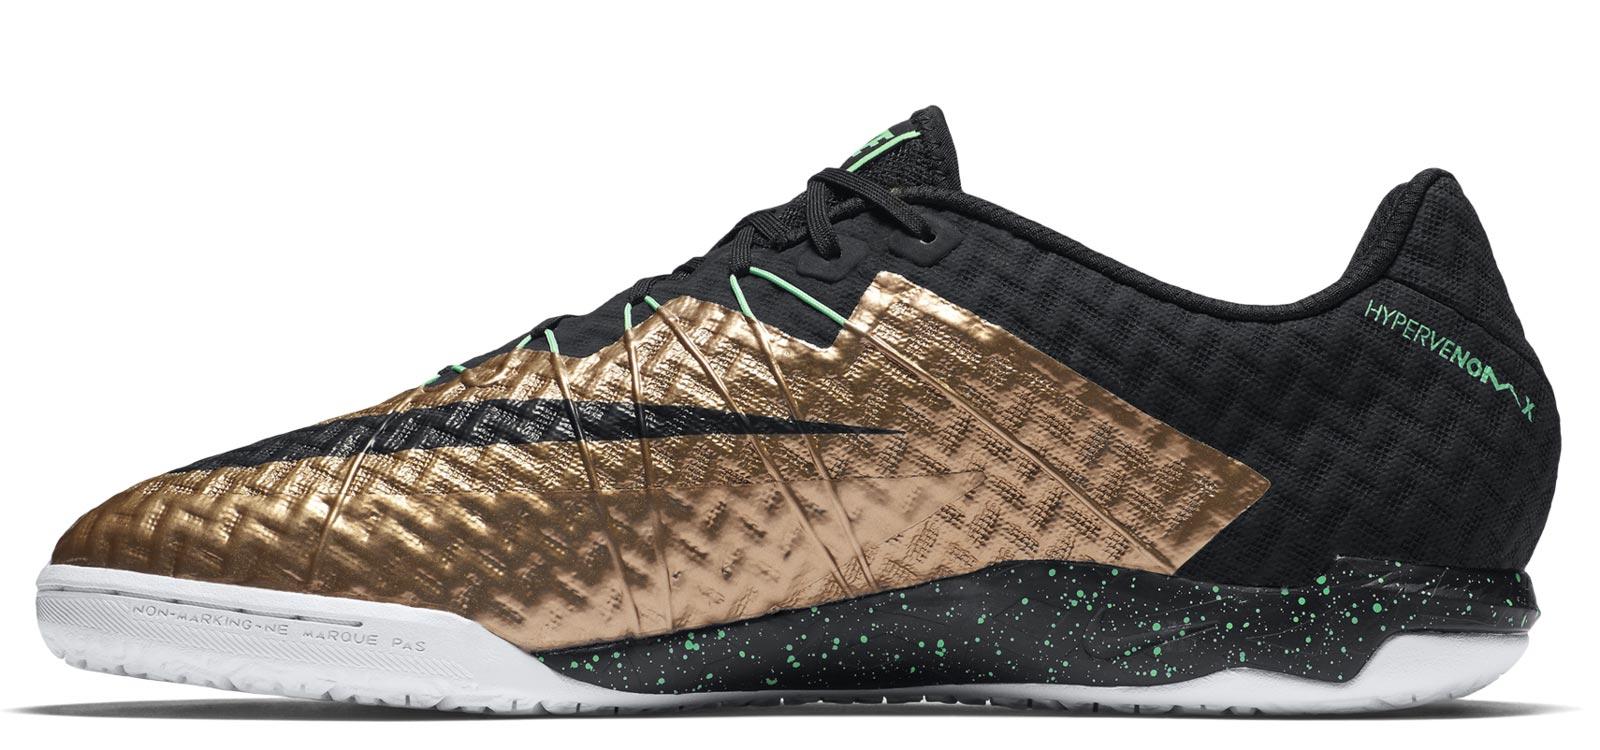 Nike Hypervenom X Hallenschuhe